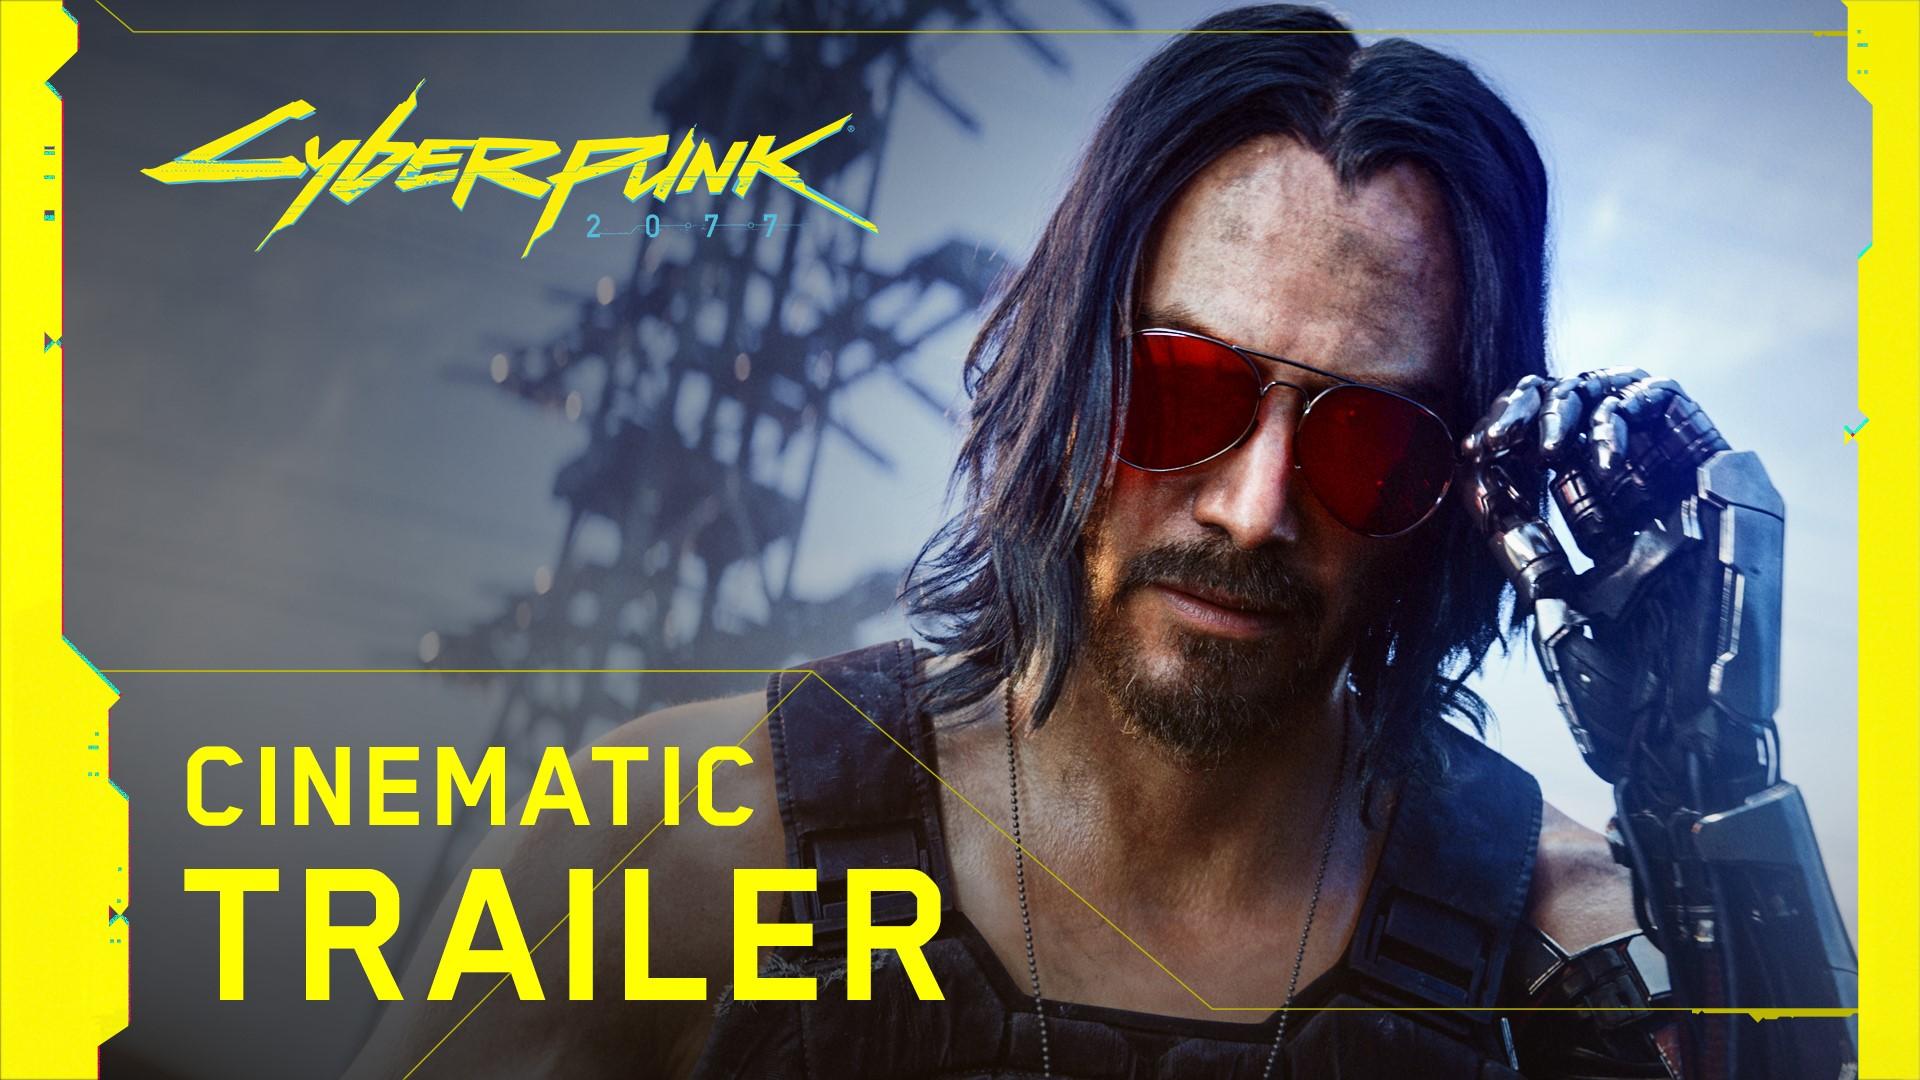 Cyberpunk 2077 Keanu Reeves_Thumbnail